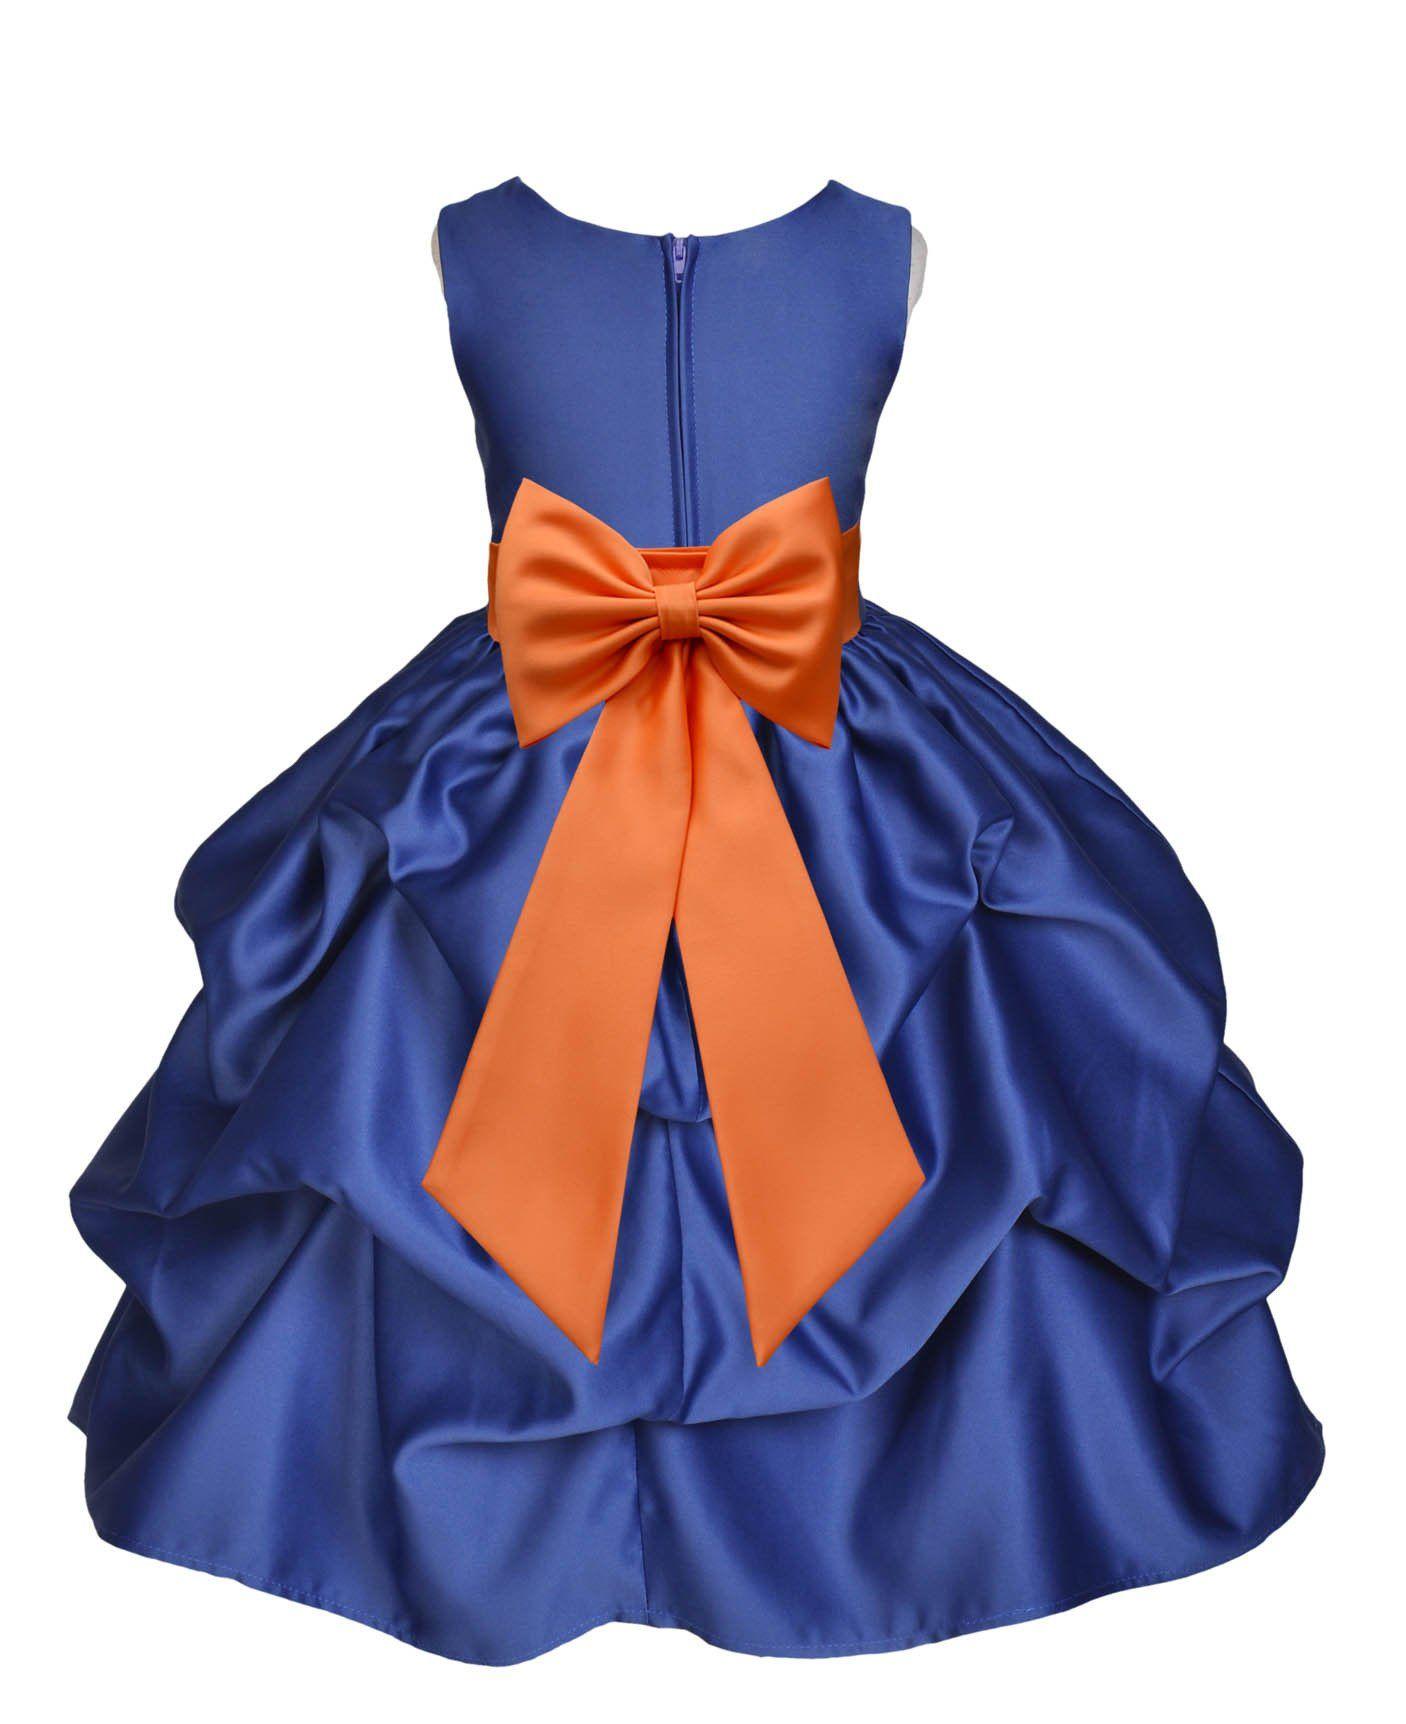 Navy blue pickup satin flower girl dress princess bridesmaid beauty